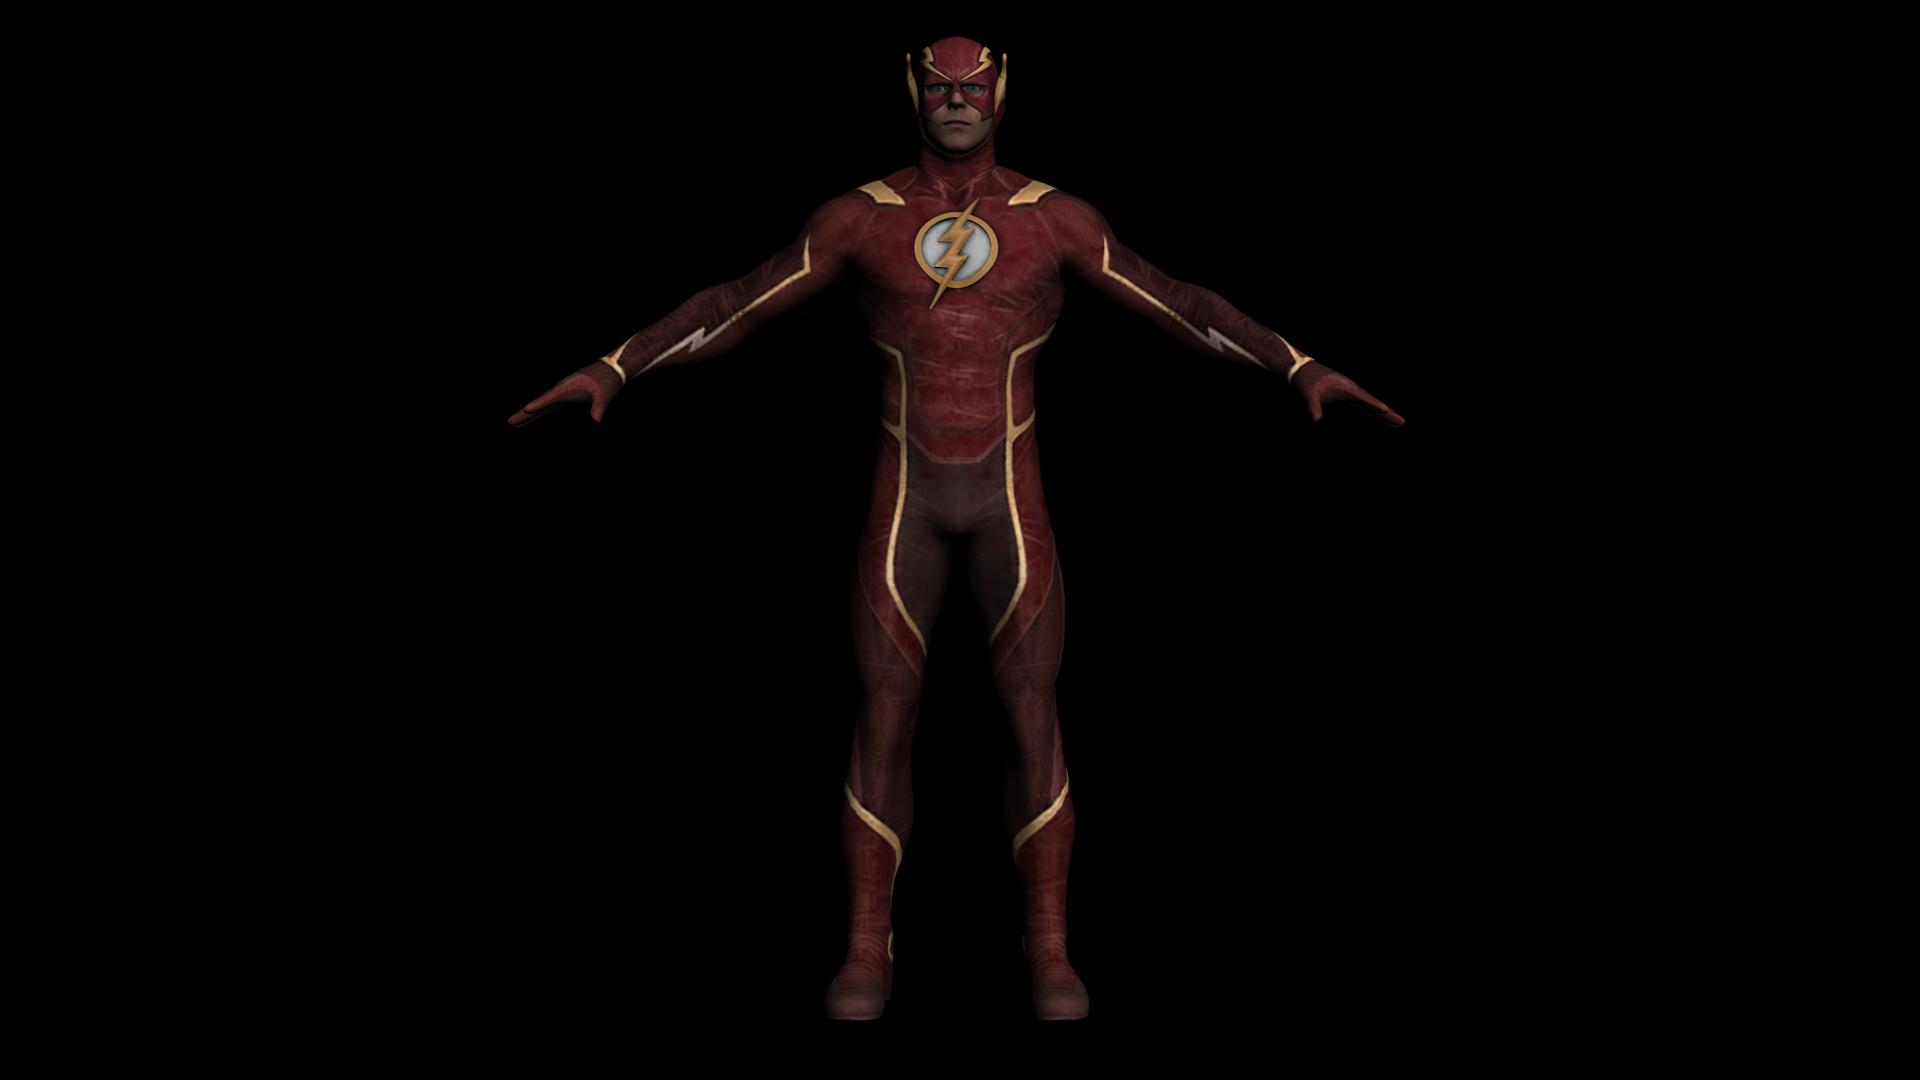 The flash injustice 2 mobile by laxxter on deviantart for Deviantart 3d models